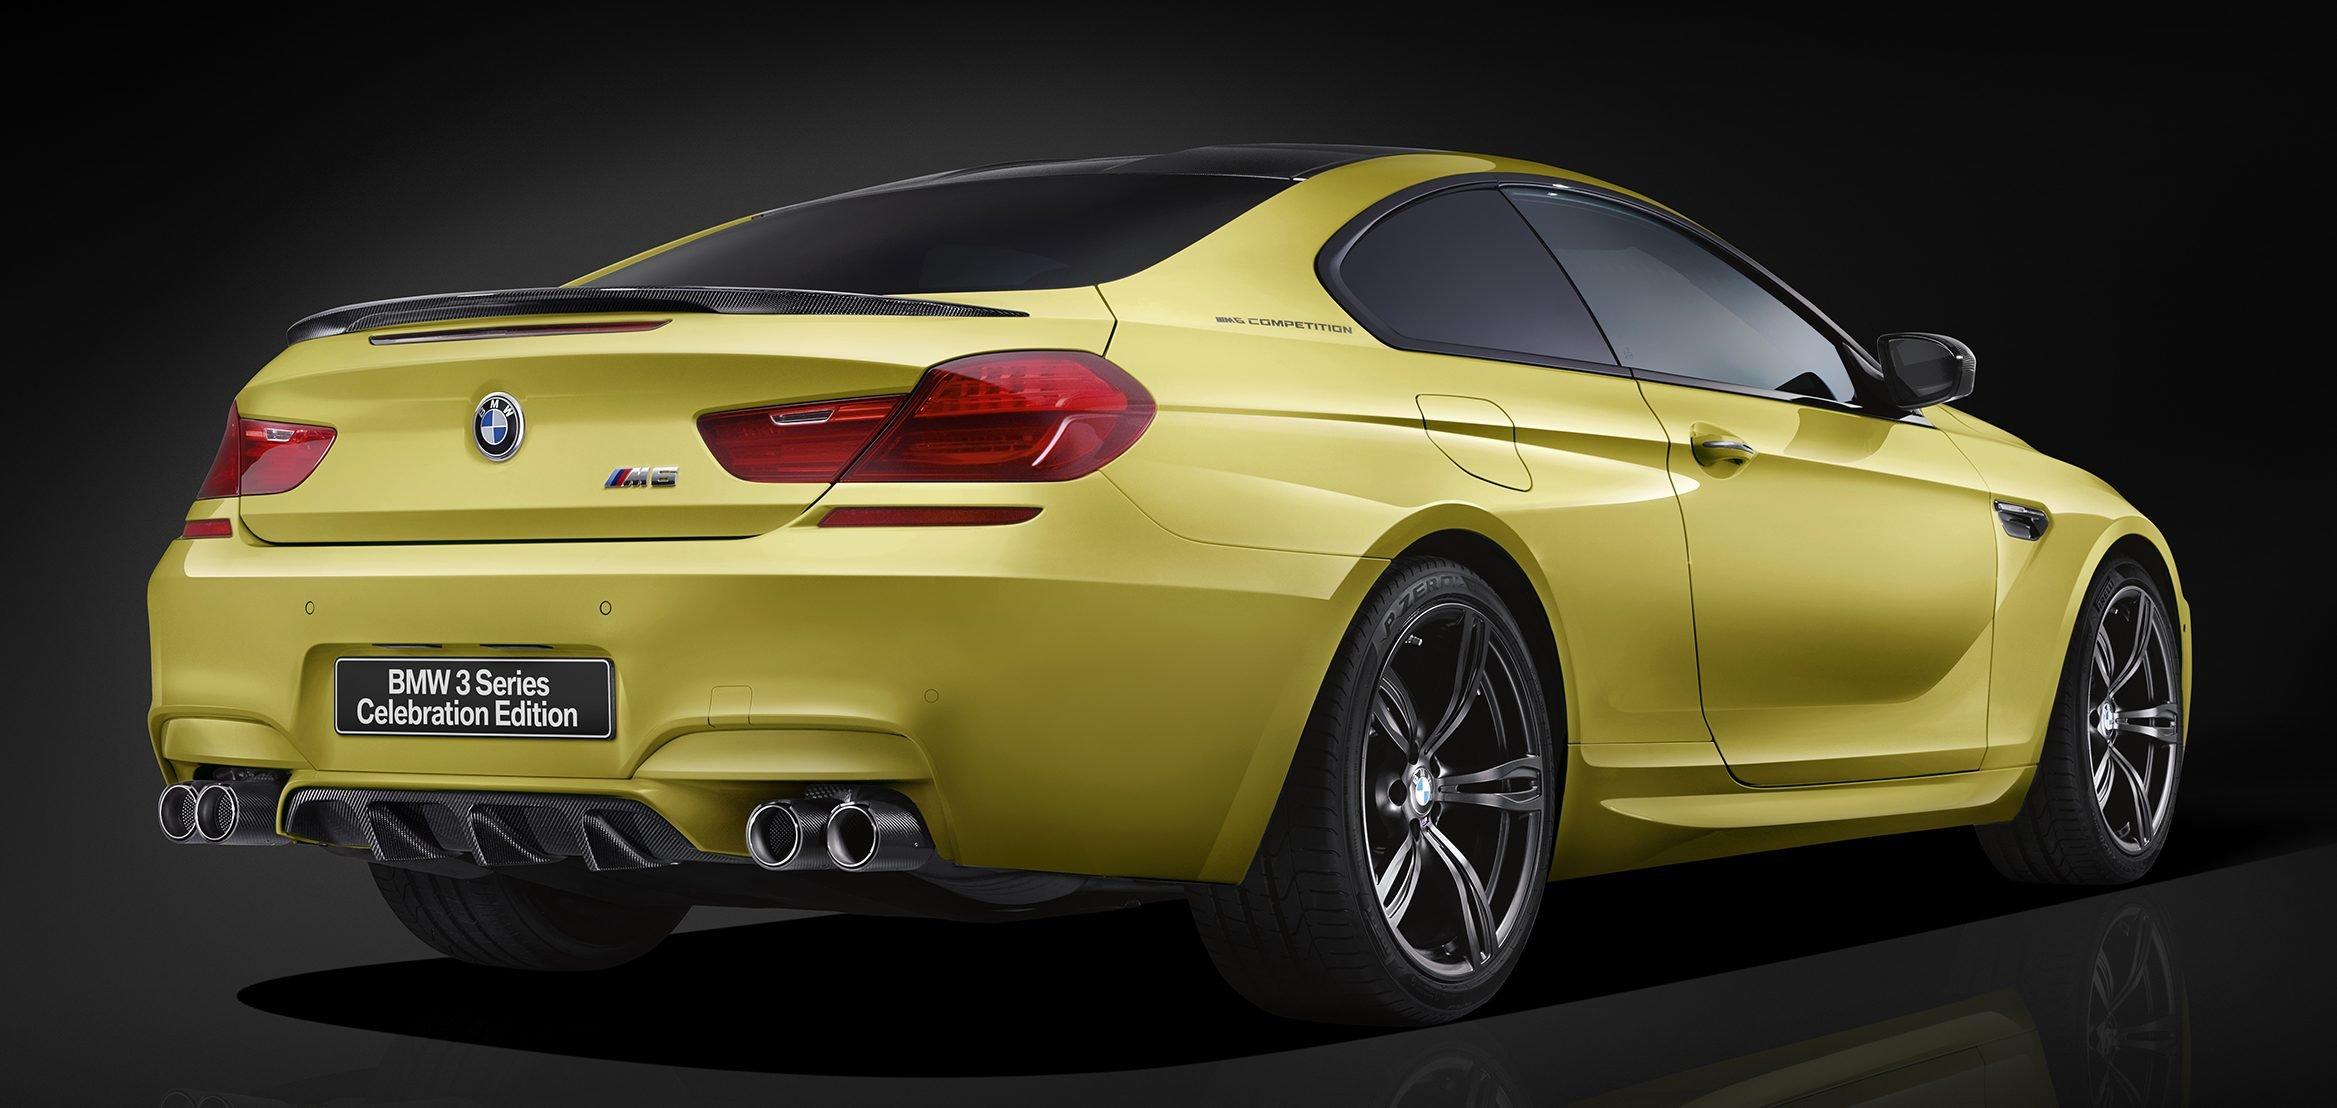 Bmw 3 2018 >> BMW M6 Coupe Celebration Edition revealed – 600 hp Paul Tan - Image 500134